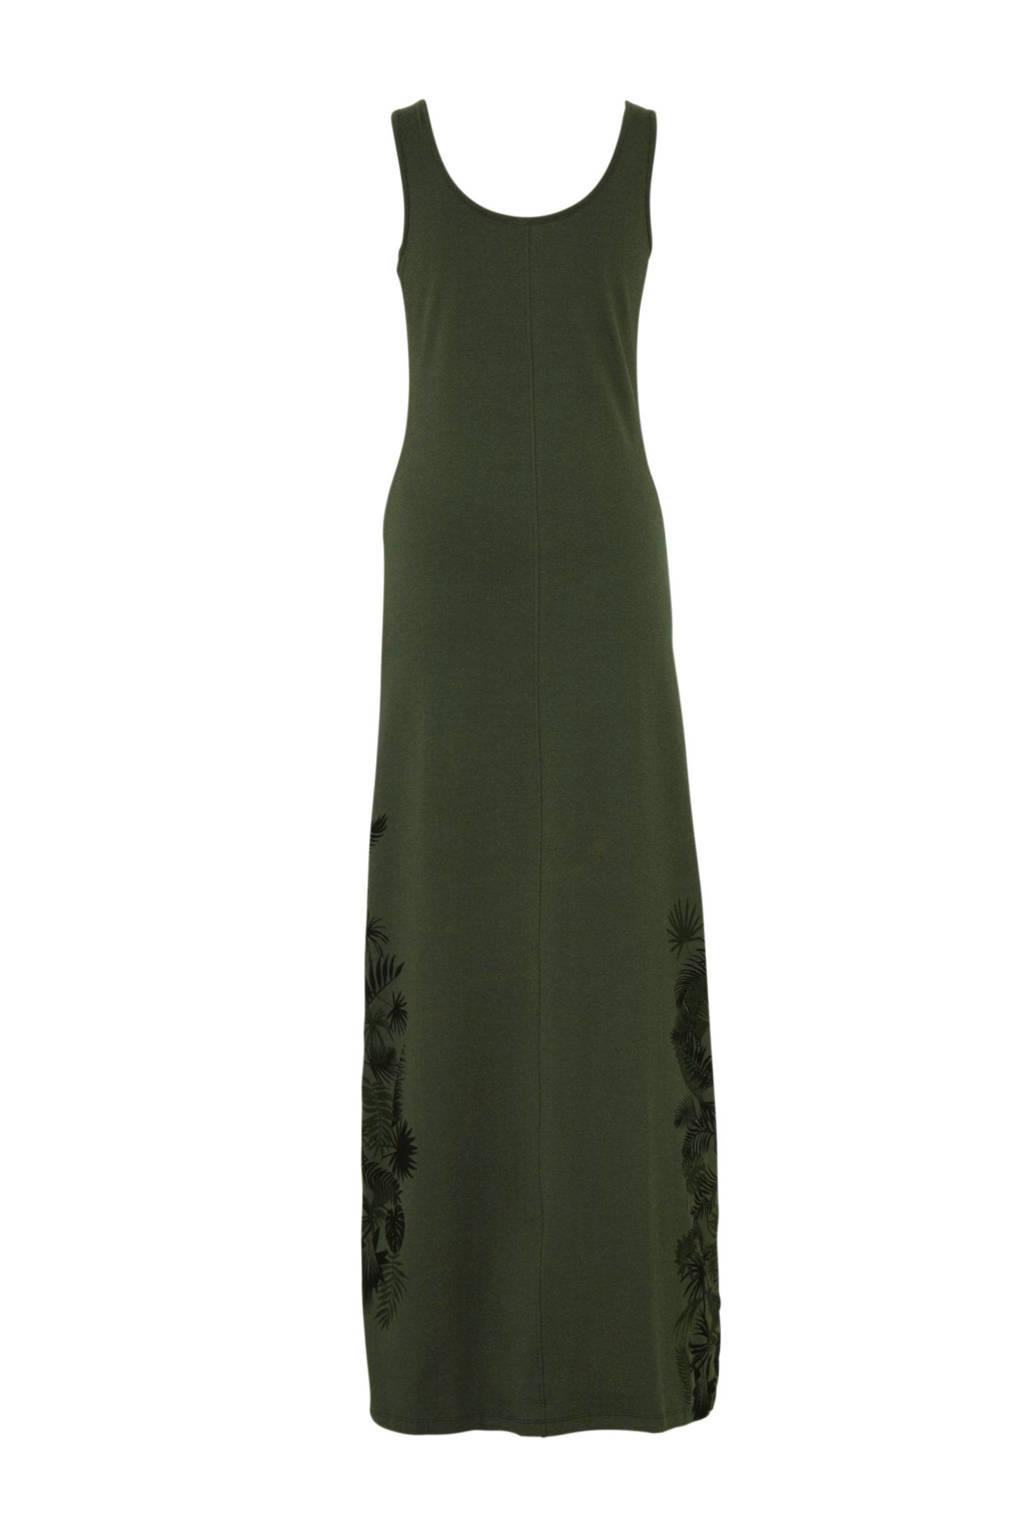 whkmp's beachwave katoenen jurk met bladprint, Donkergroen